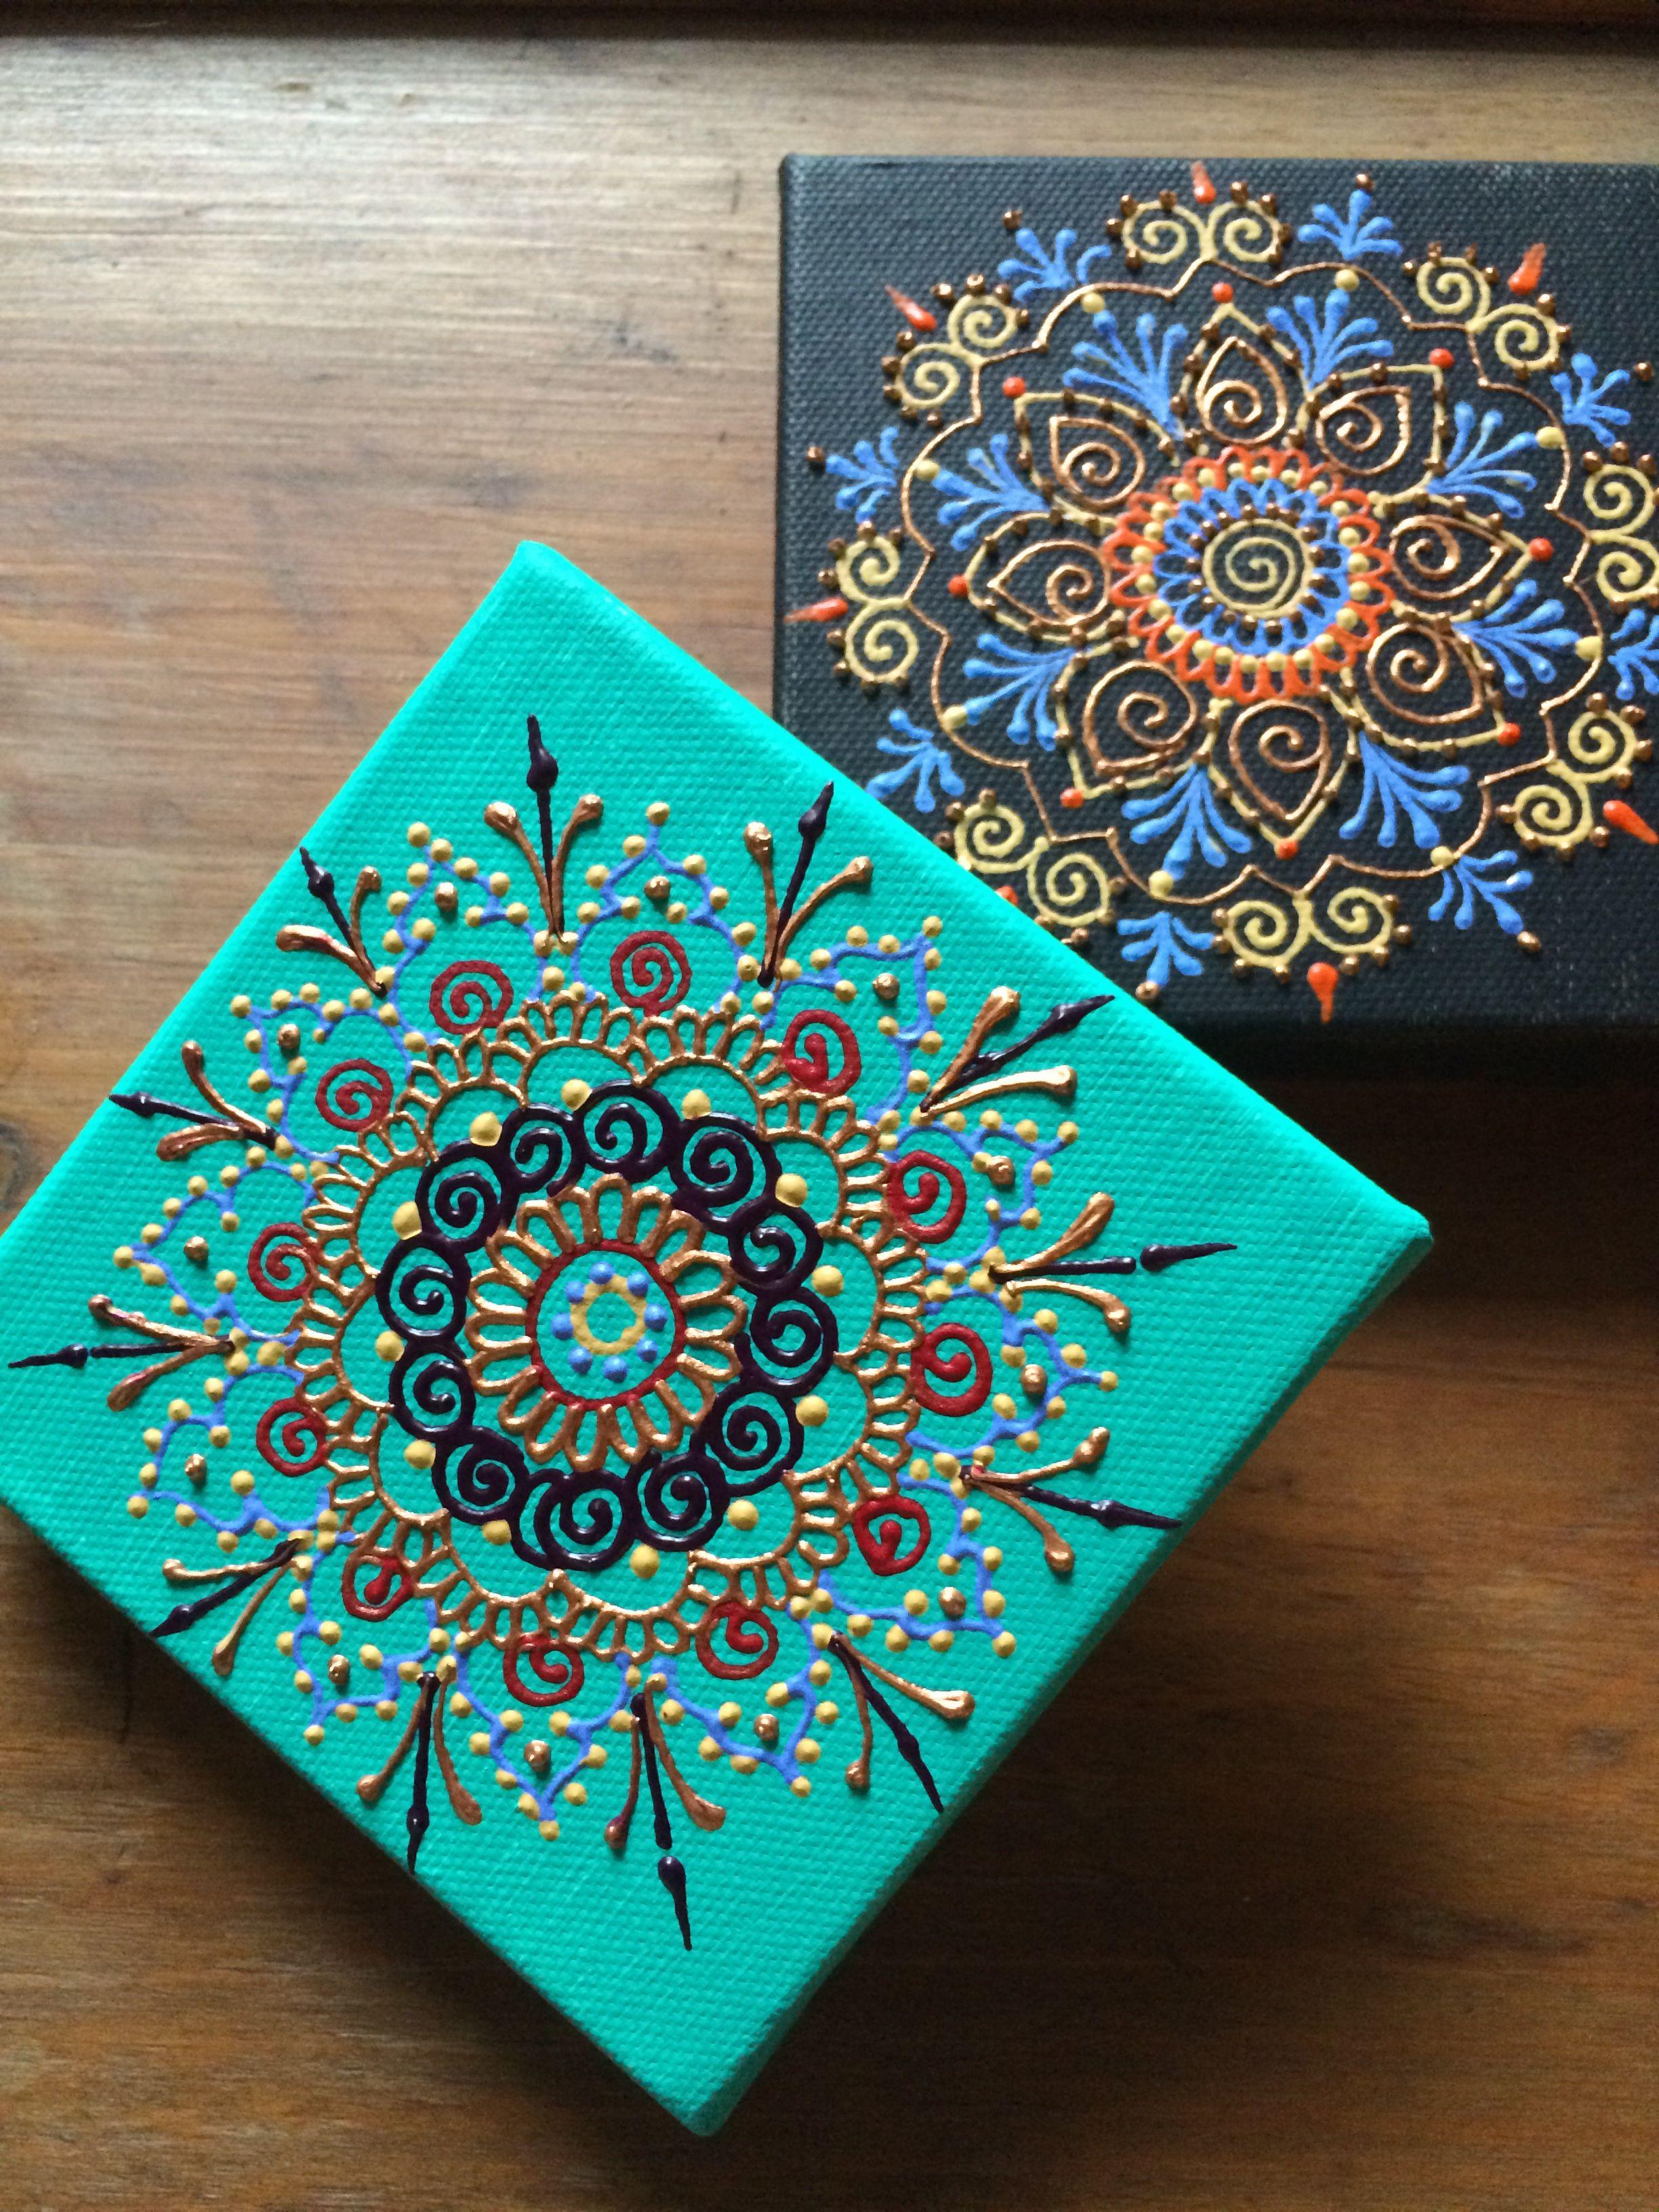 Mandalas Acrylic On Canvasback By Henna On Hudson Henna